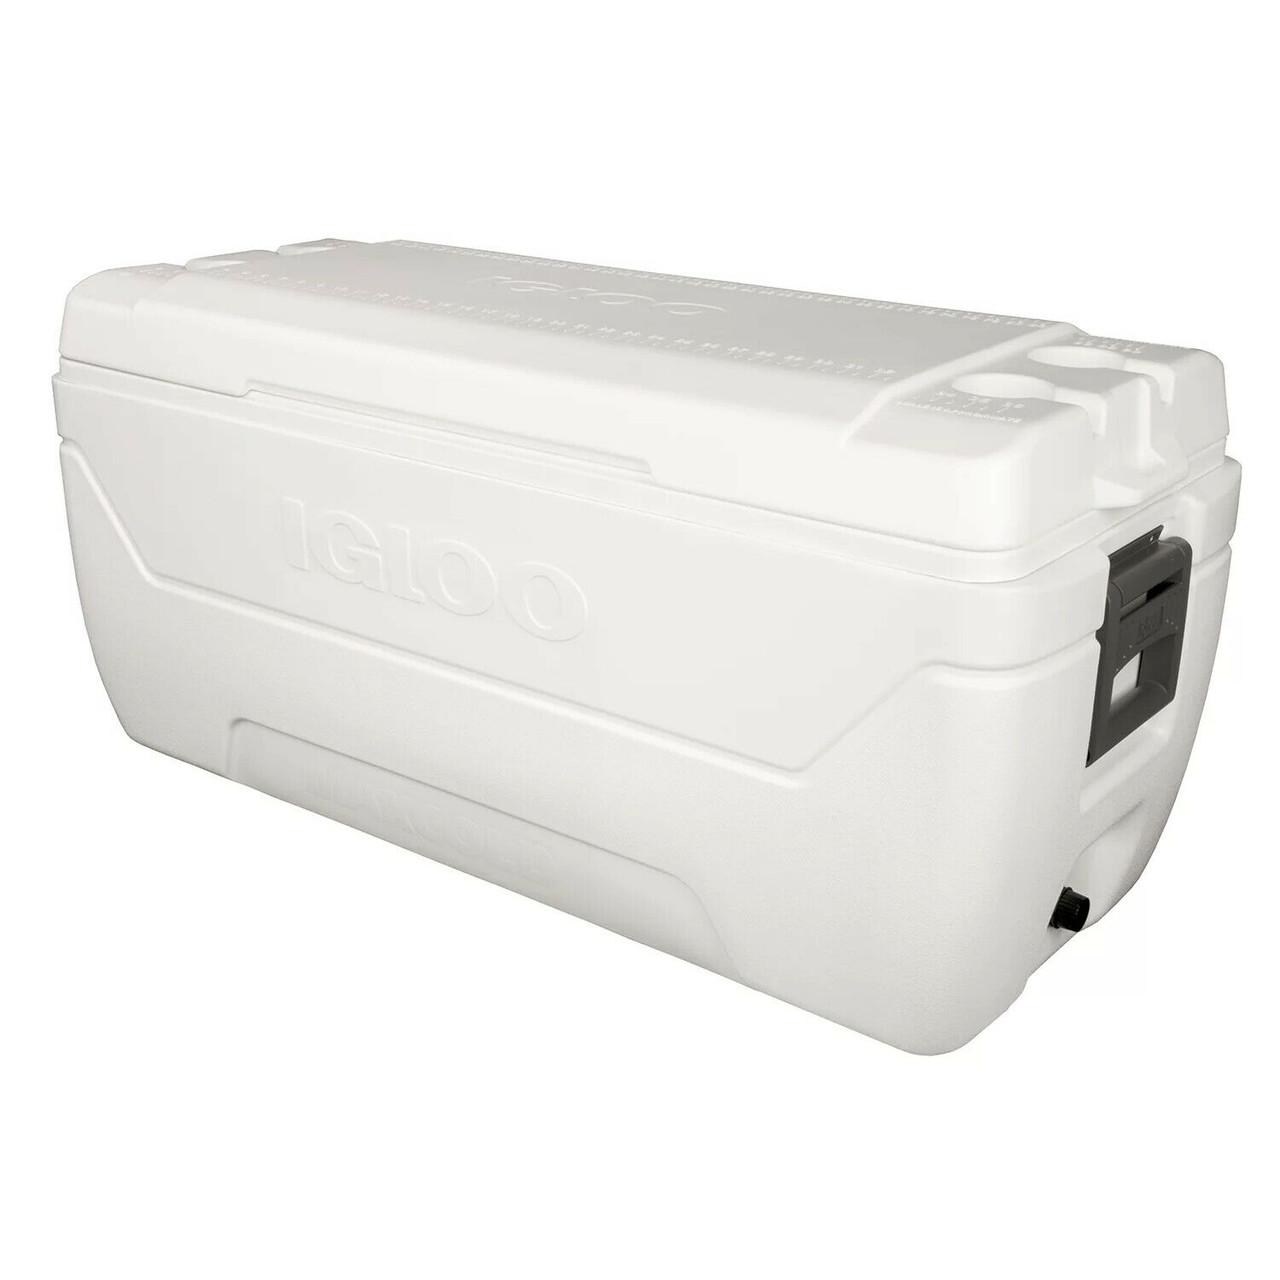 Rental - Large Cooler